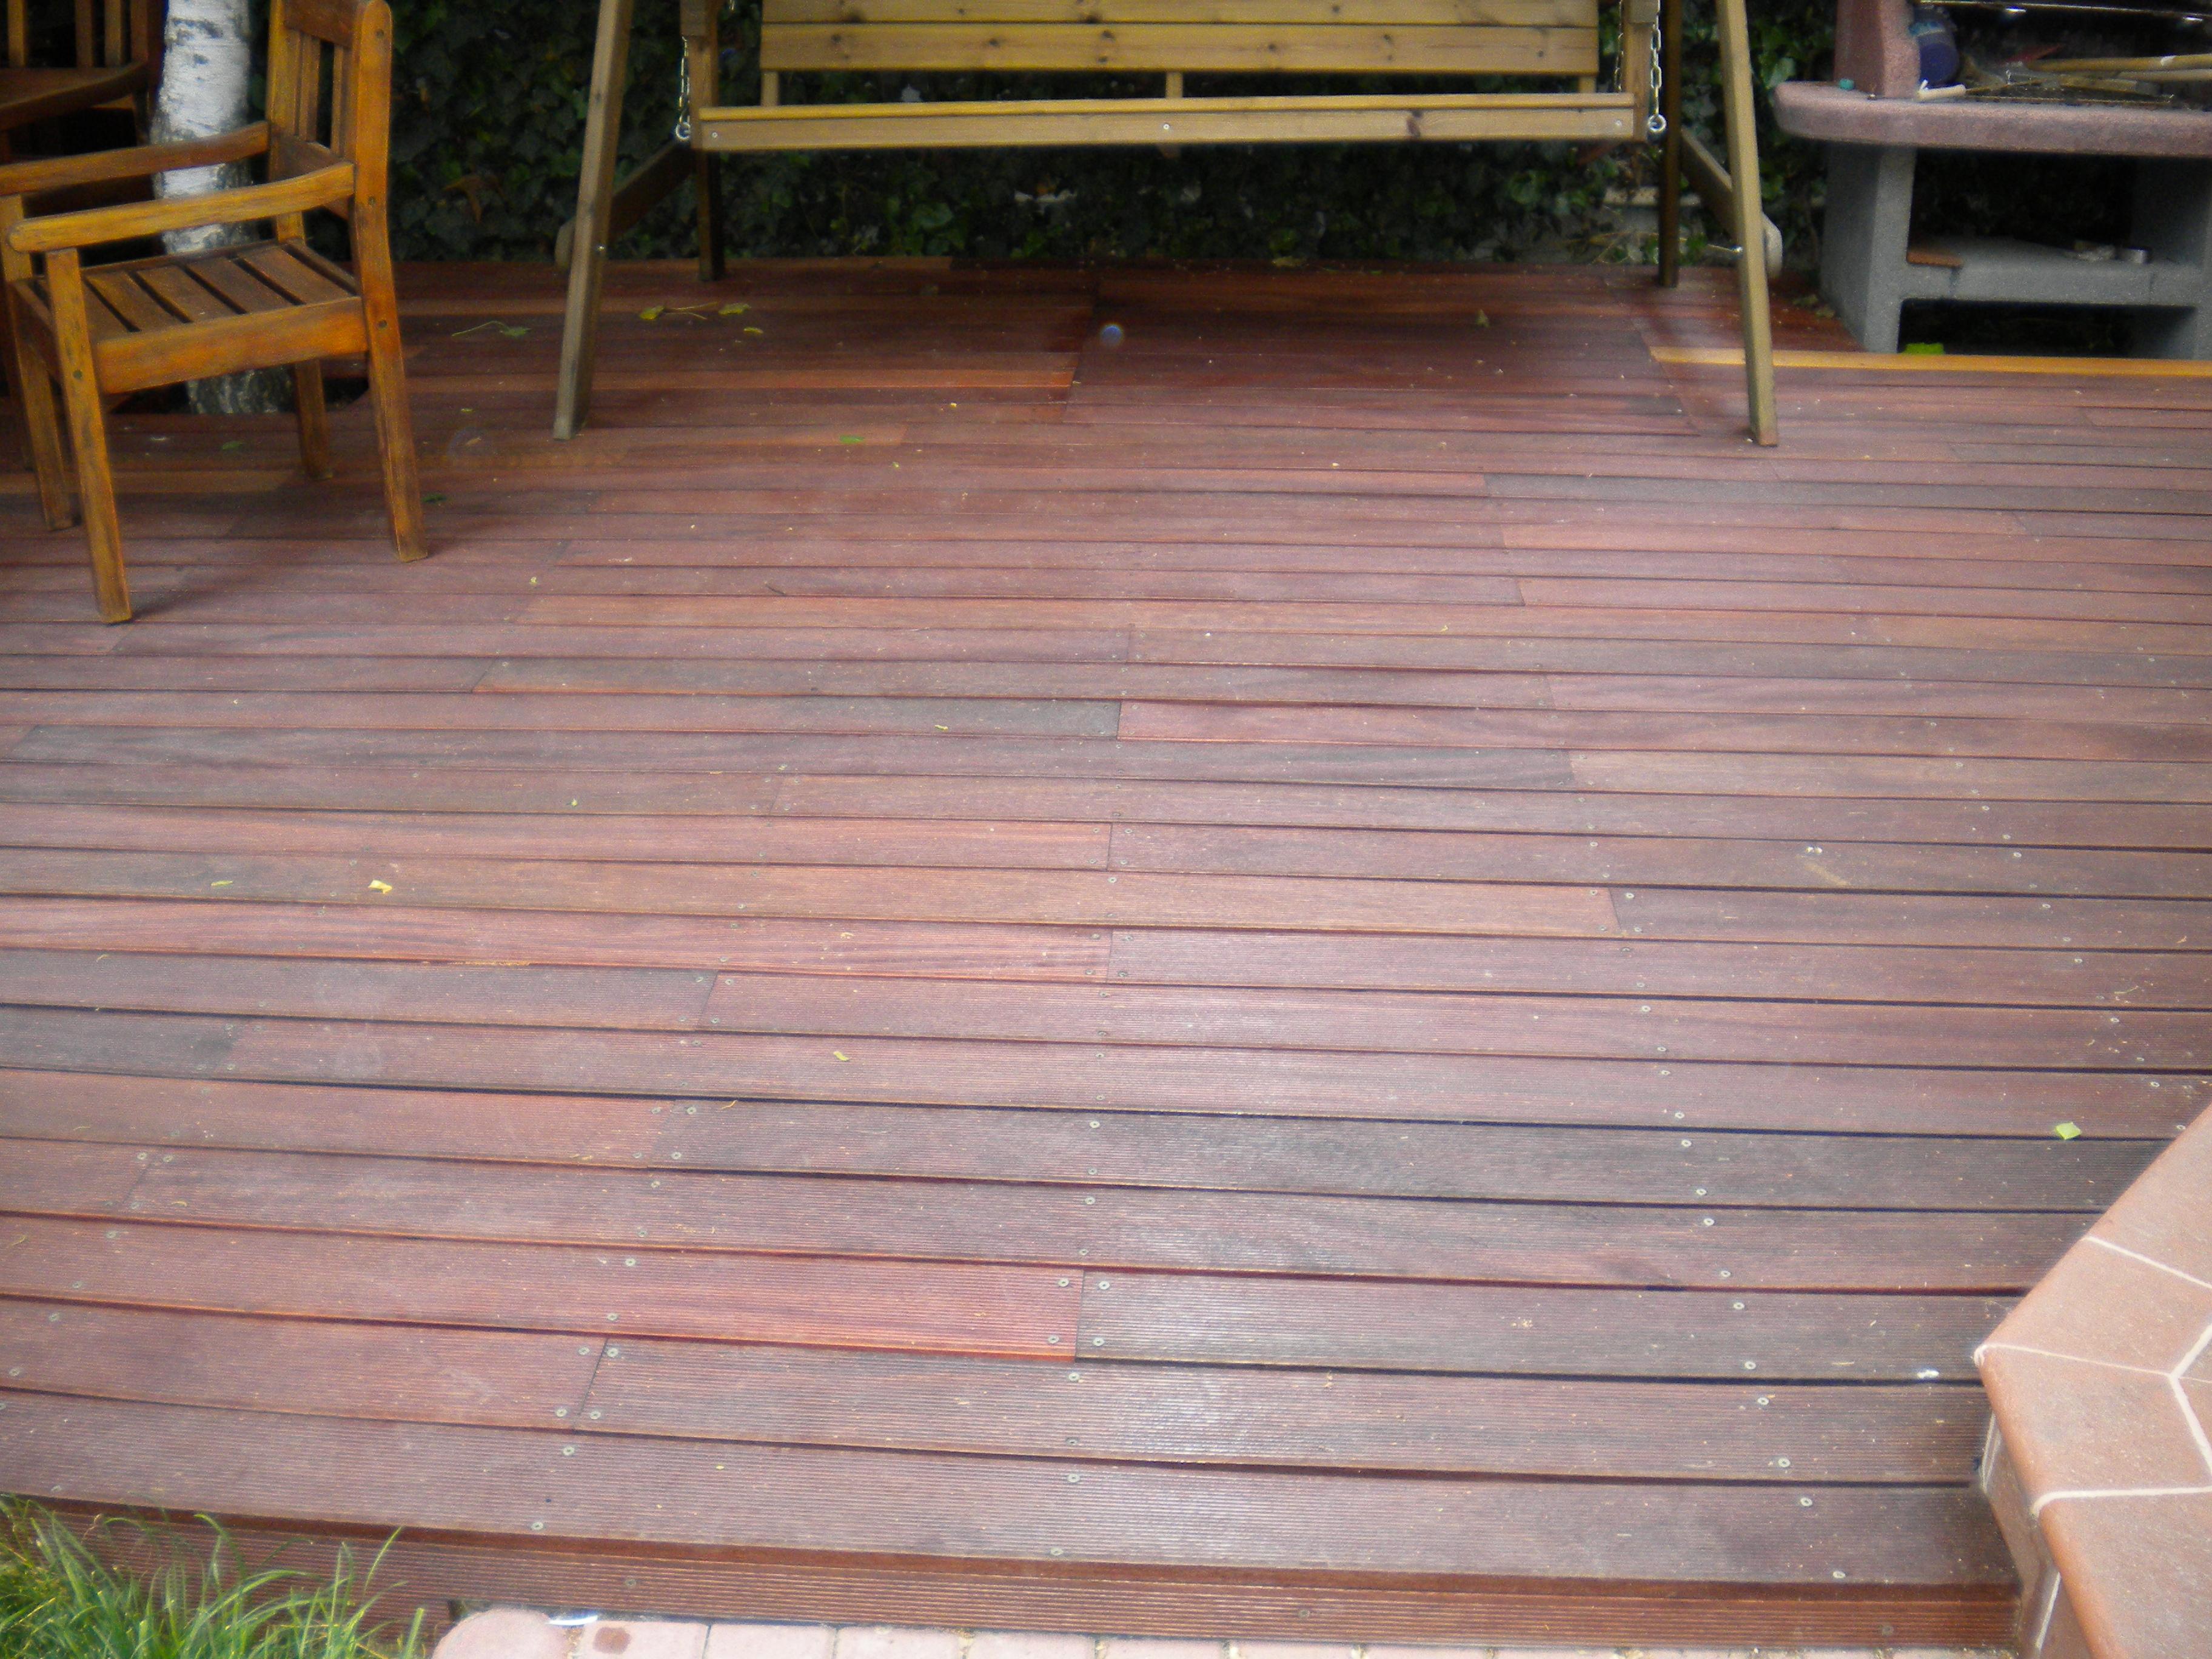 Deck-uri lemn - Uxi SELVA FLOORS - Poza 4